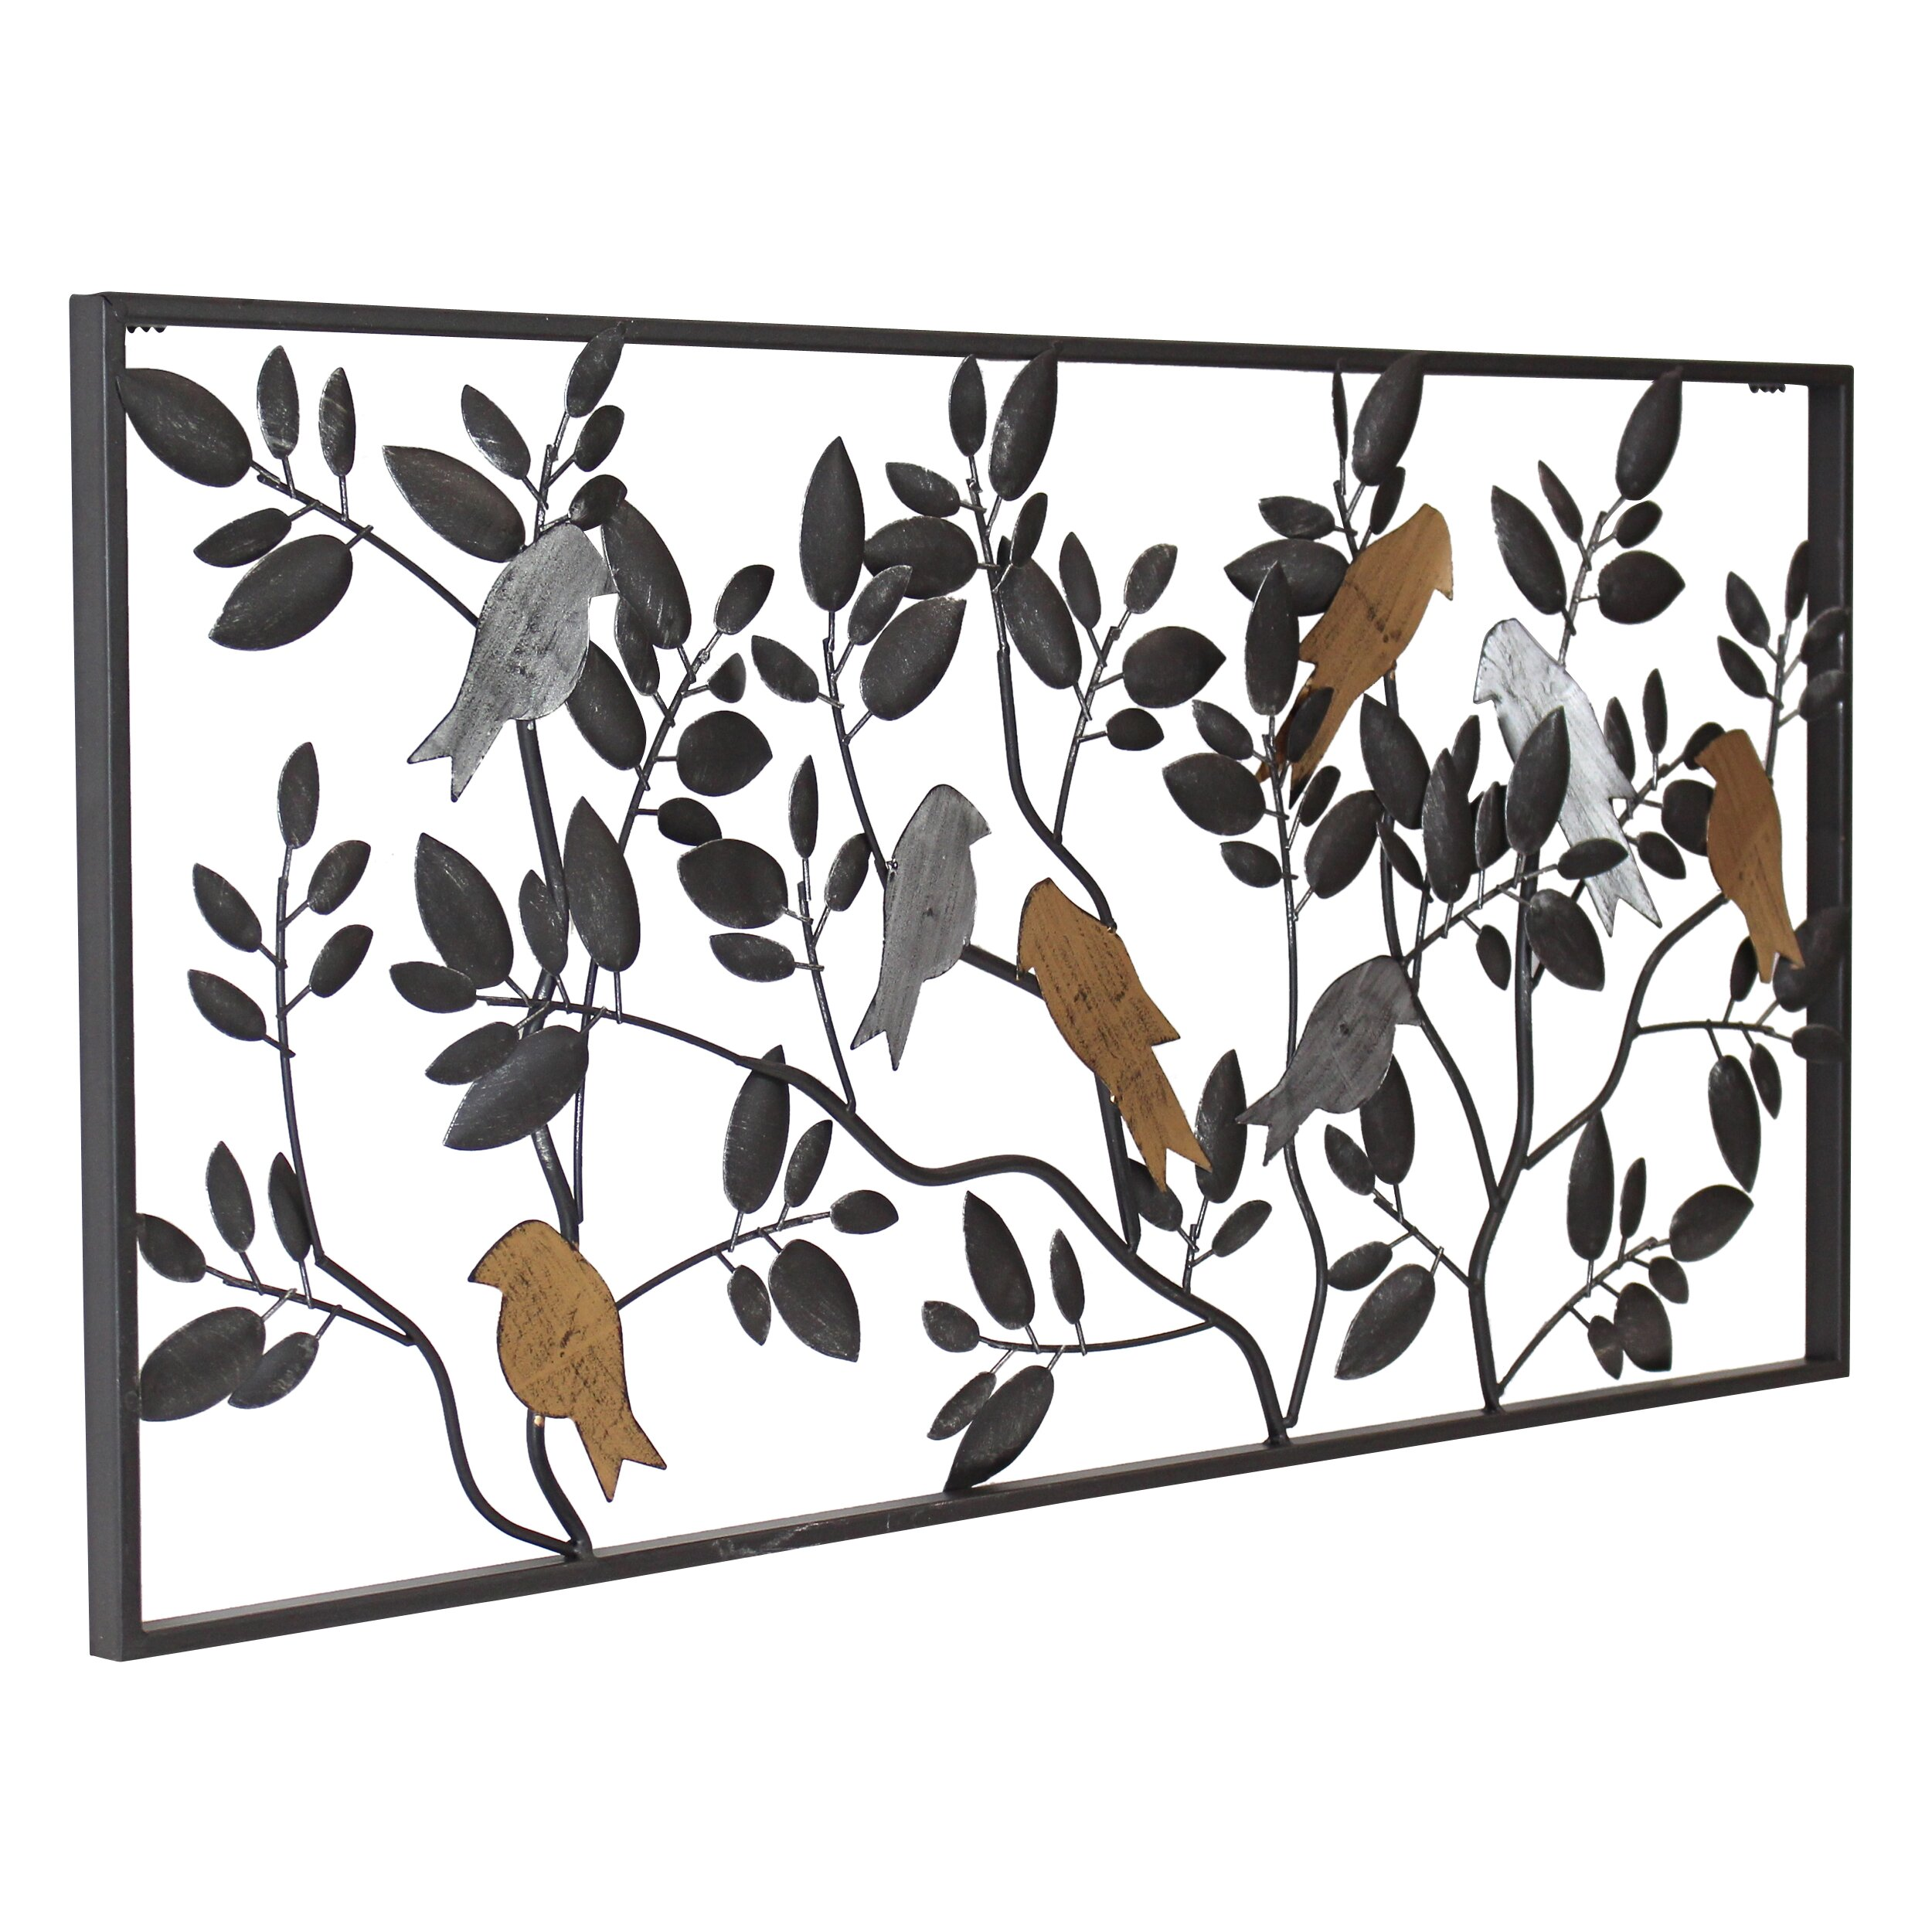 Wall Art Mirror Birds : Aspire harmony bird wall d?cor reviews wayfair